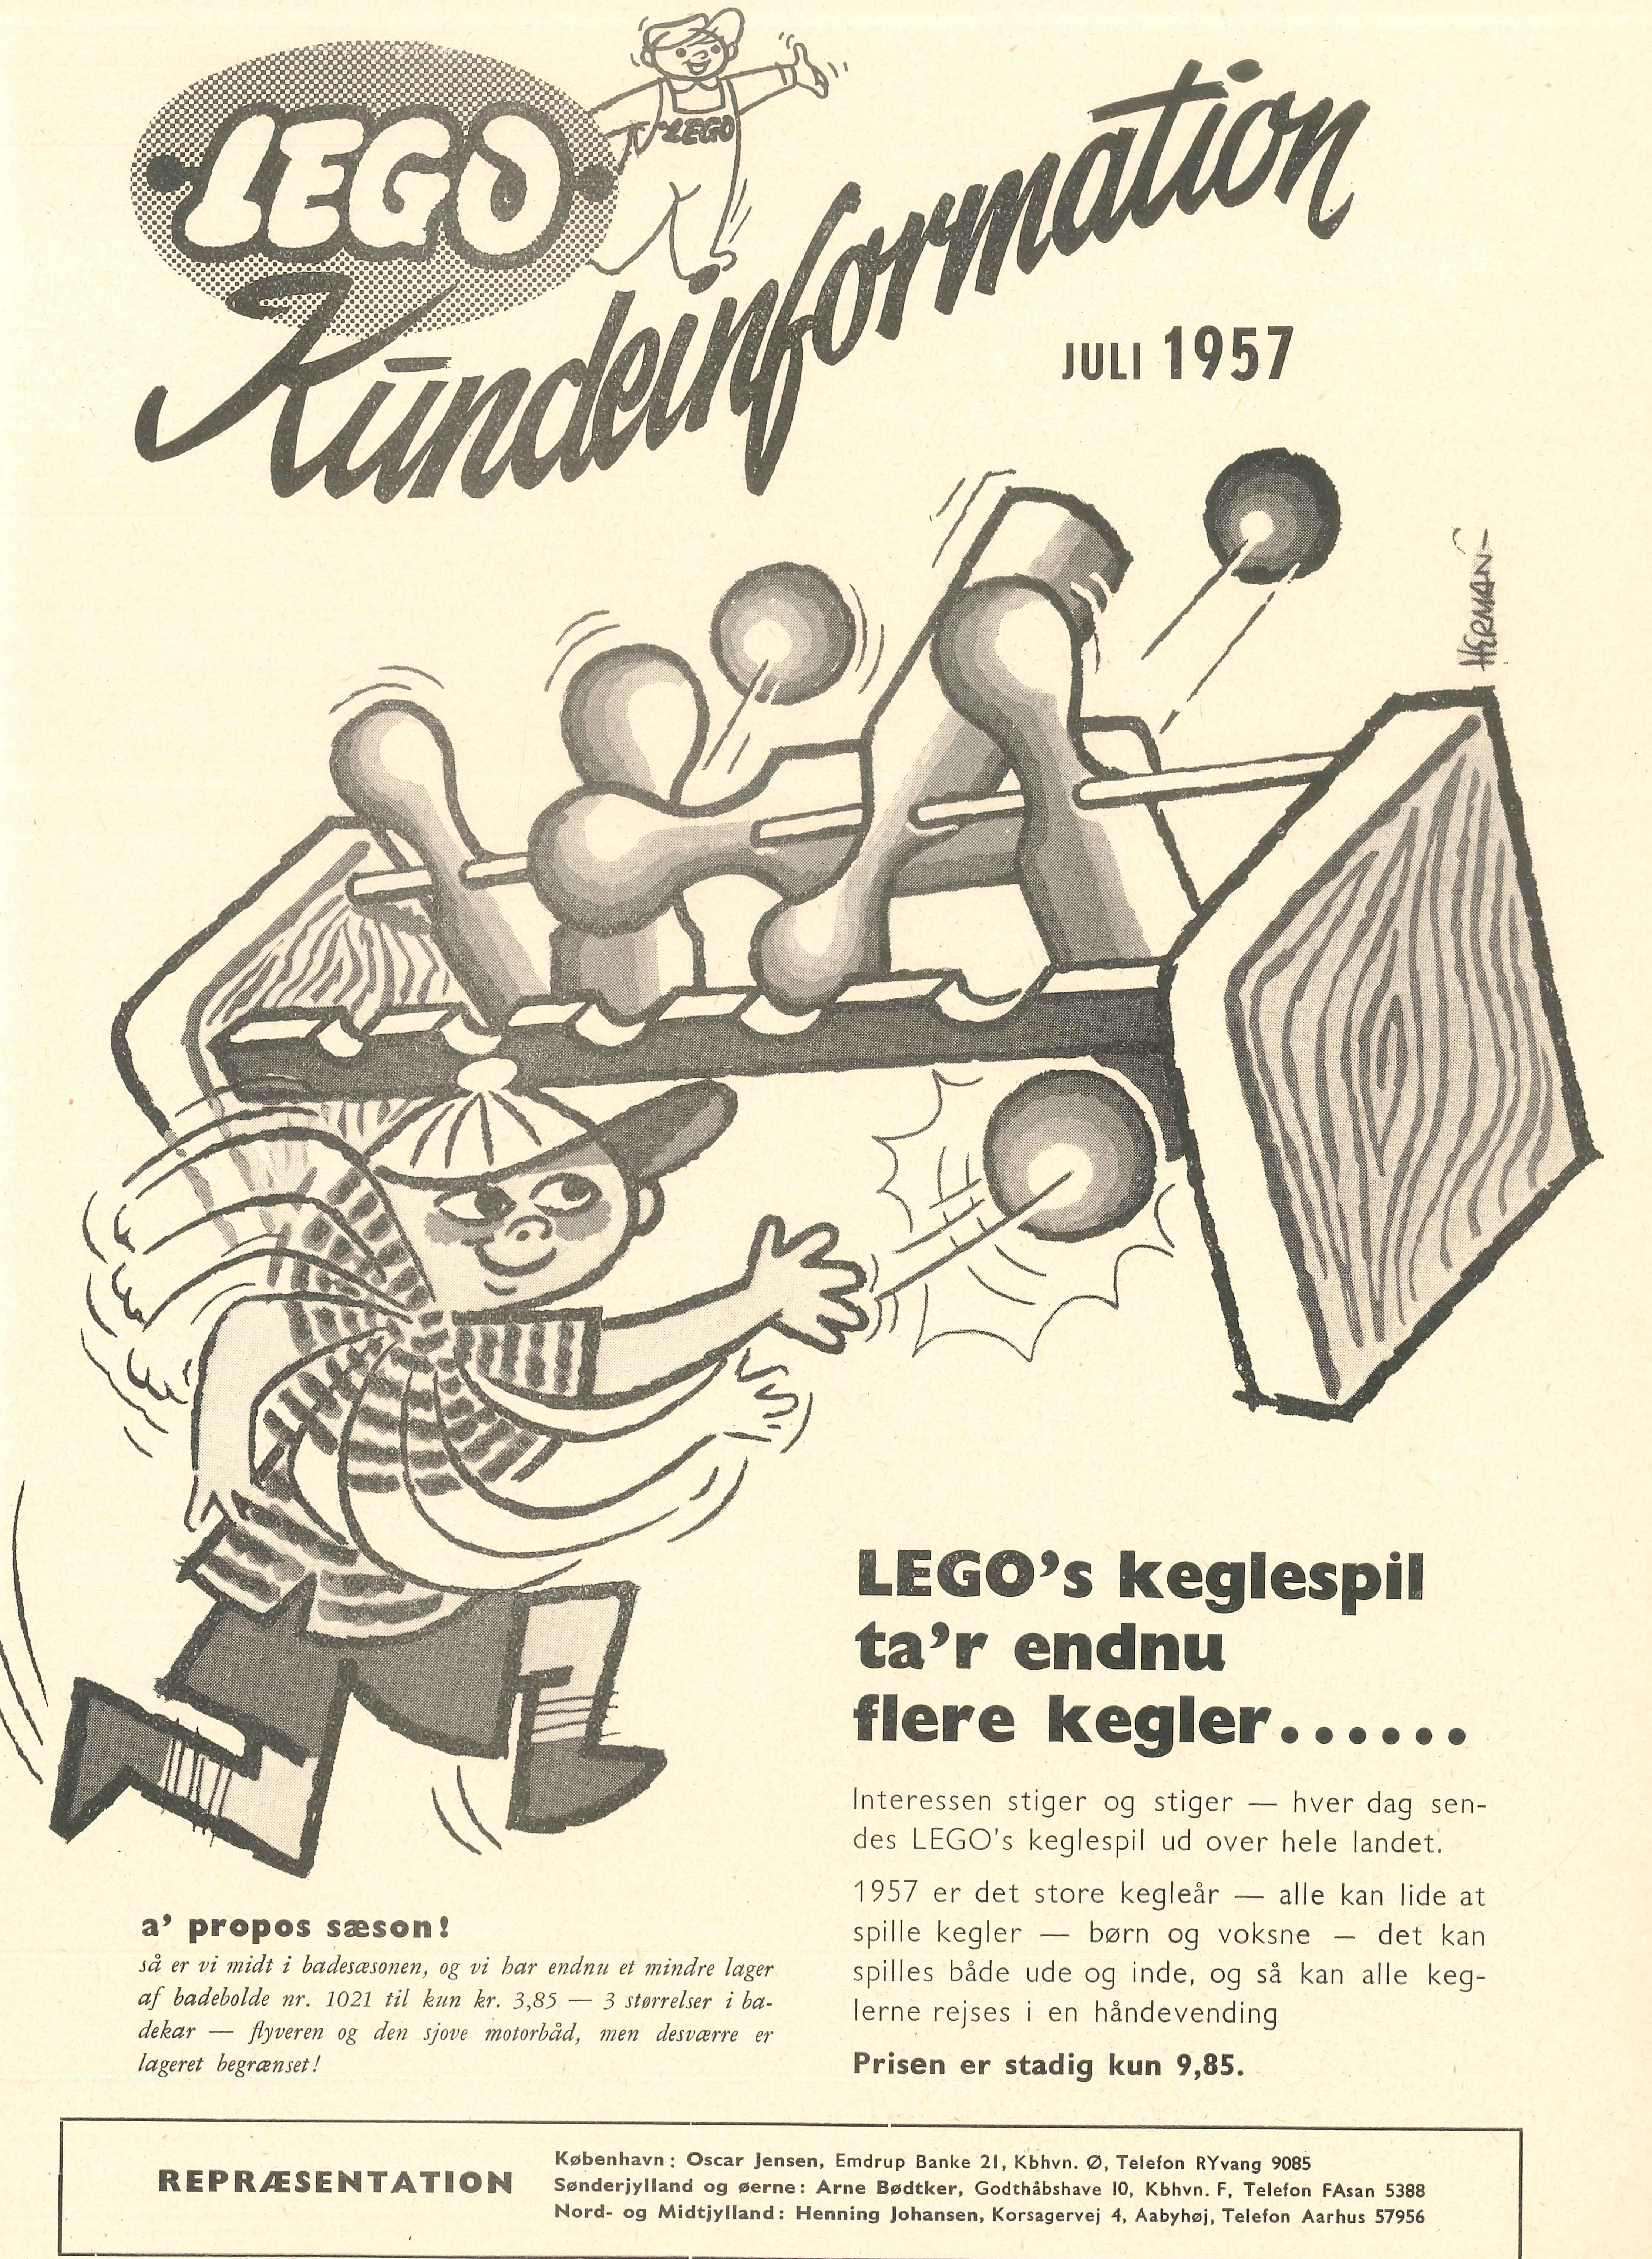 1957 Lego Juli Keglespil